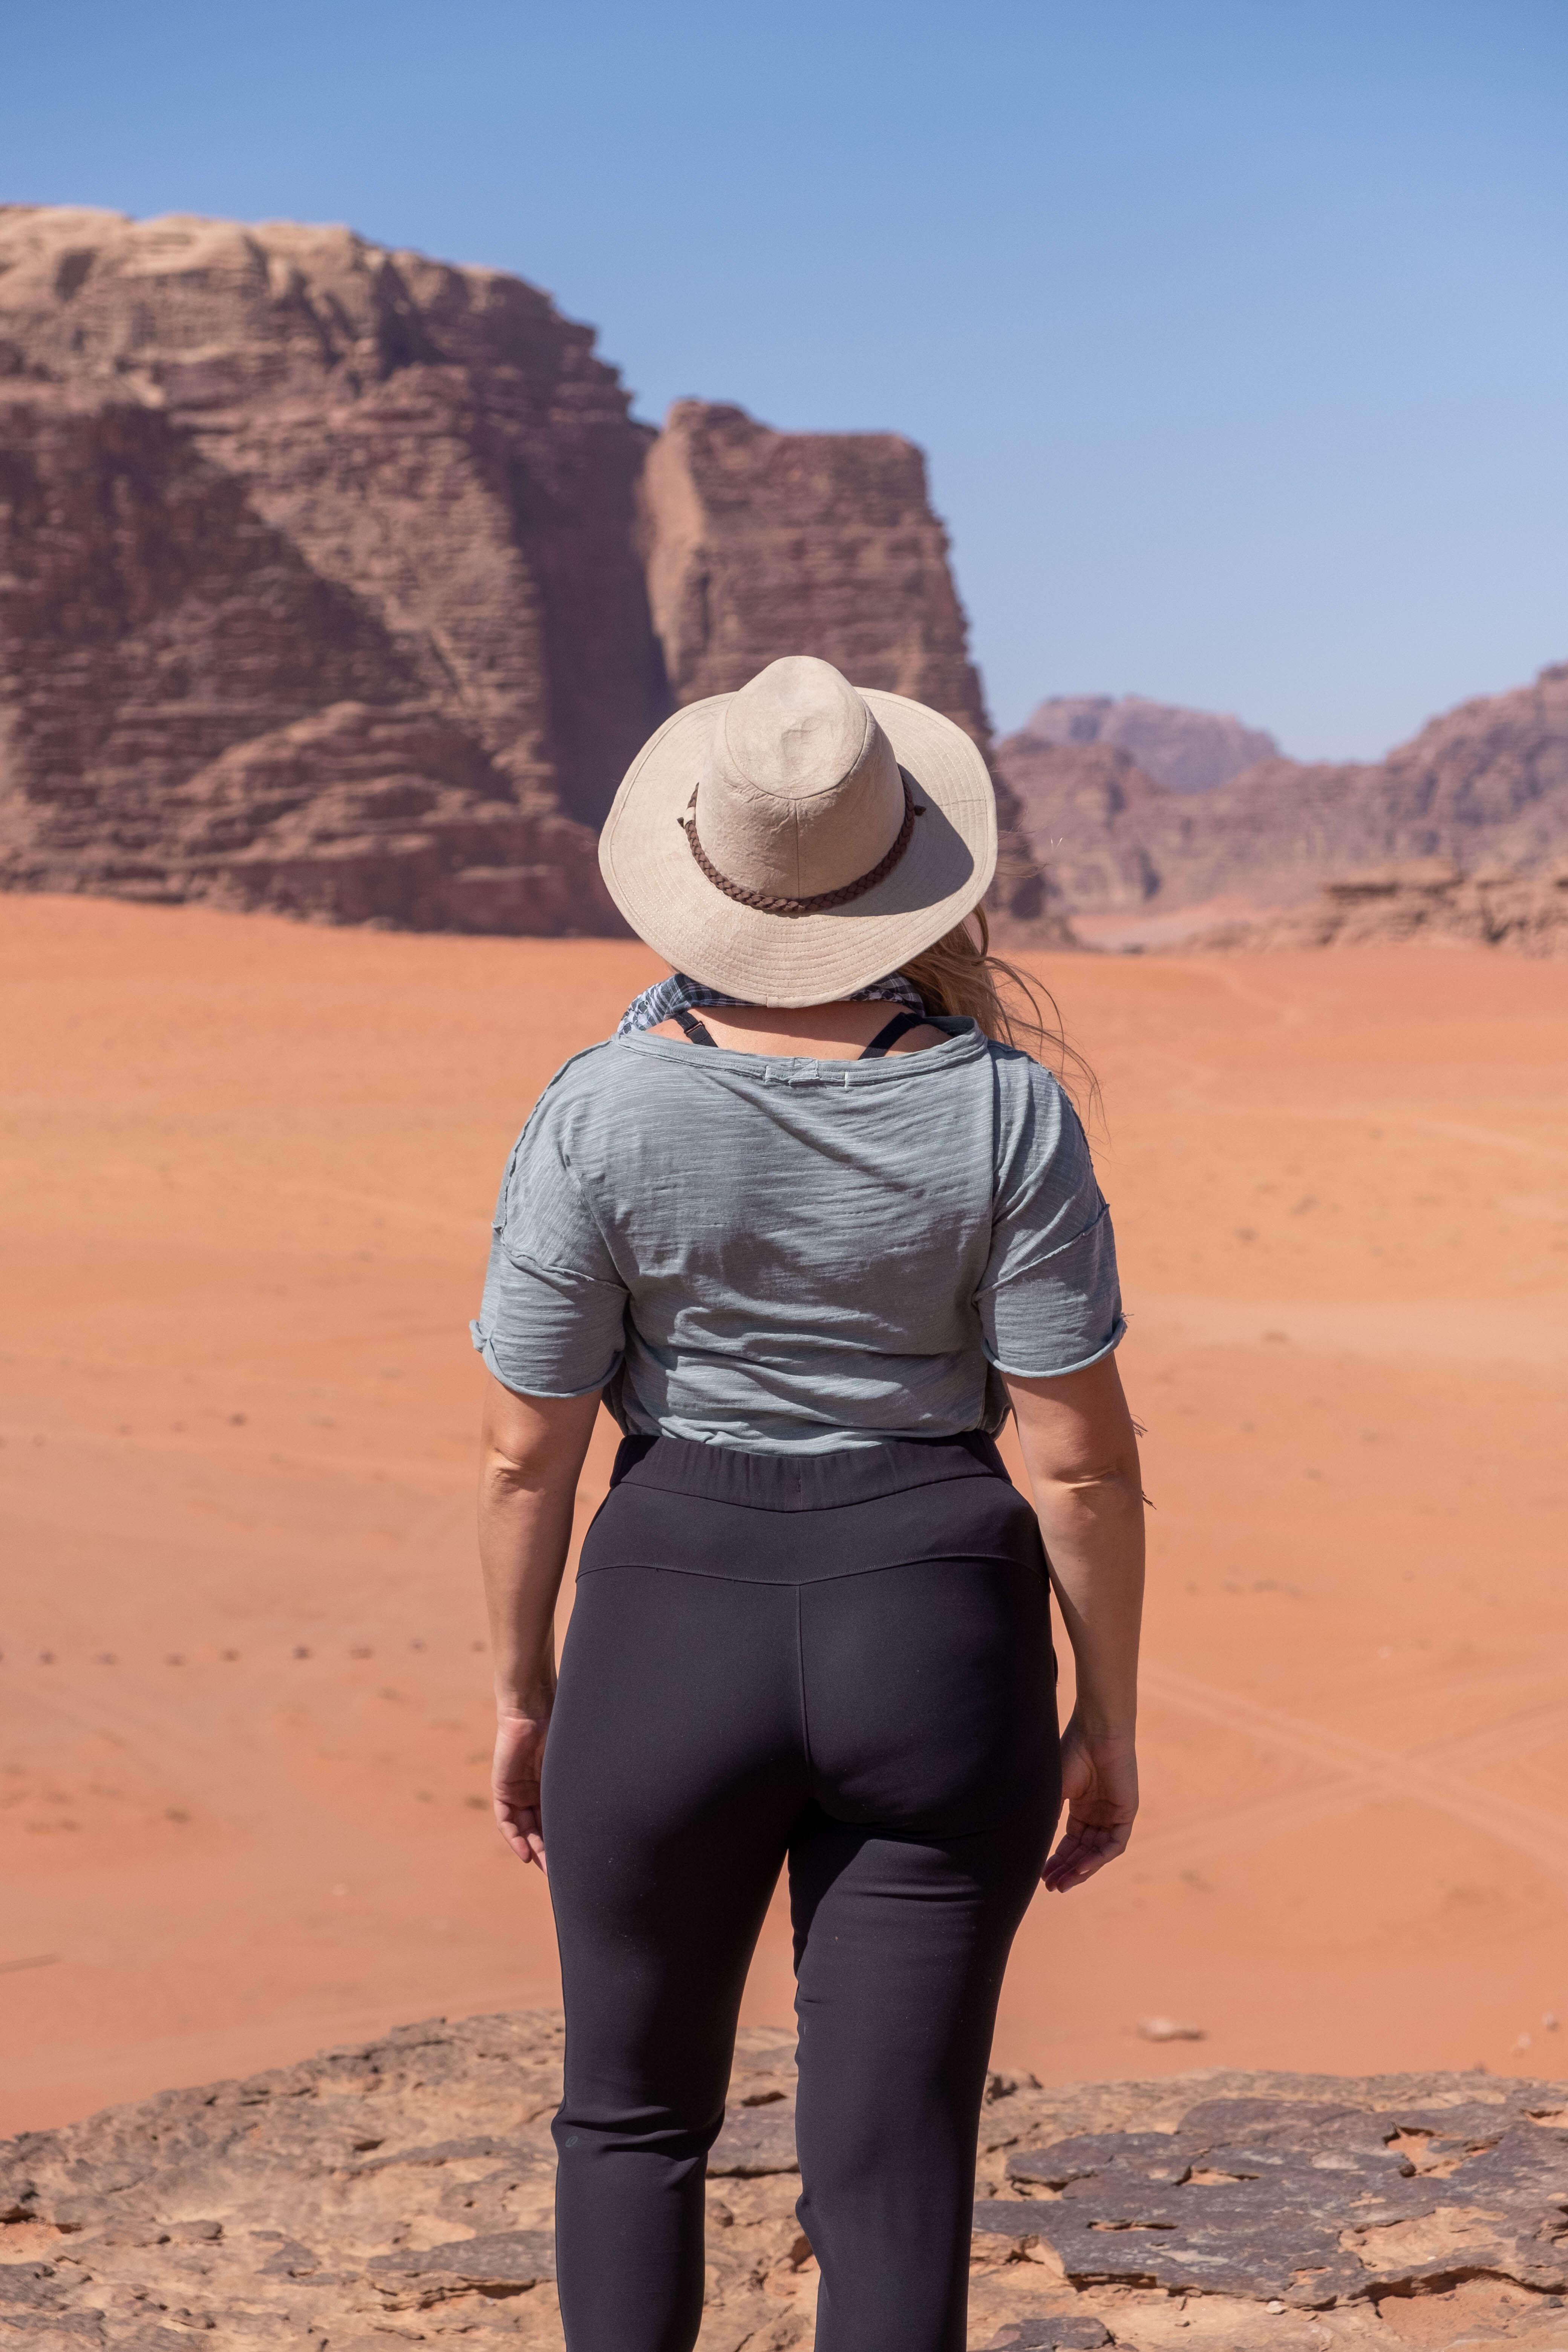 women standing in the desert